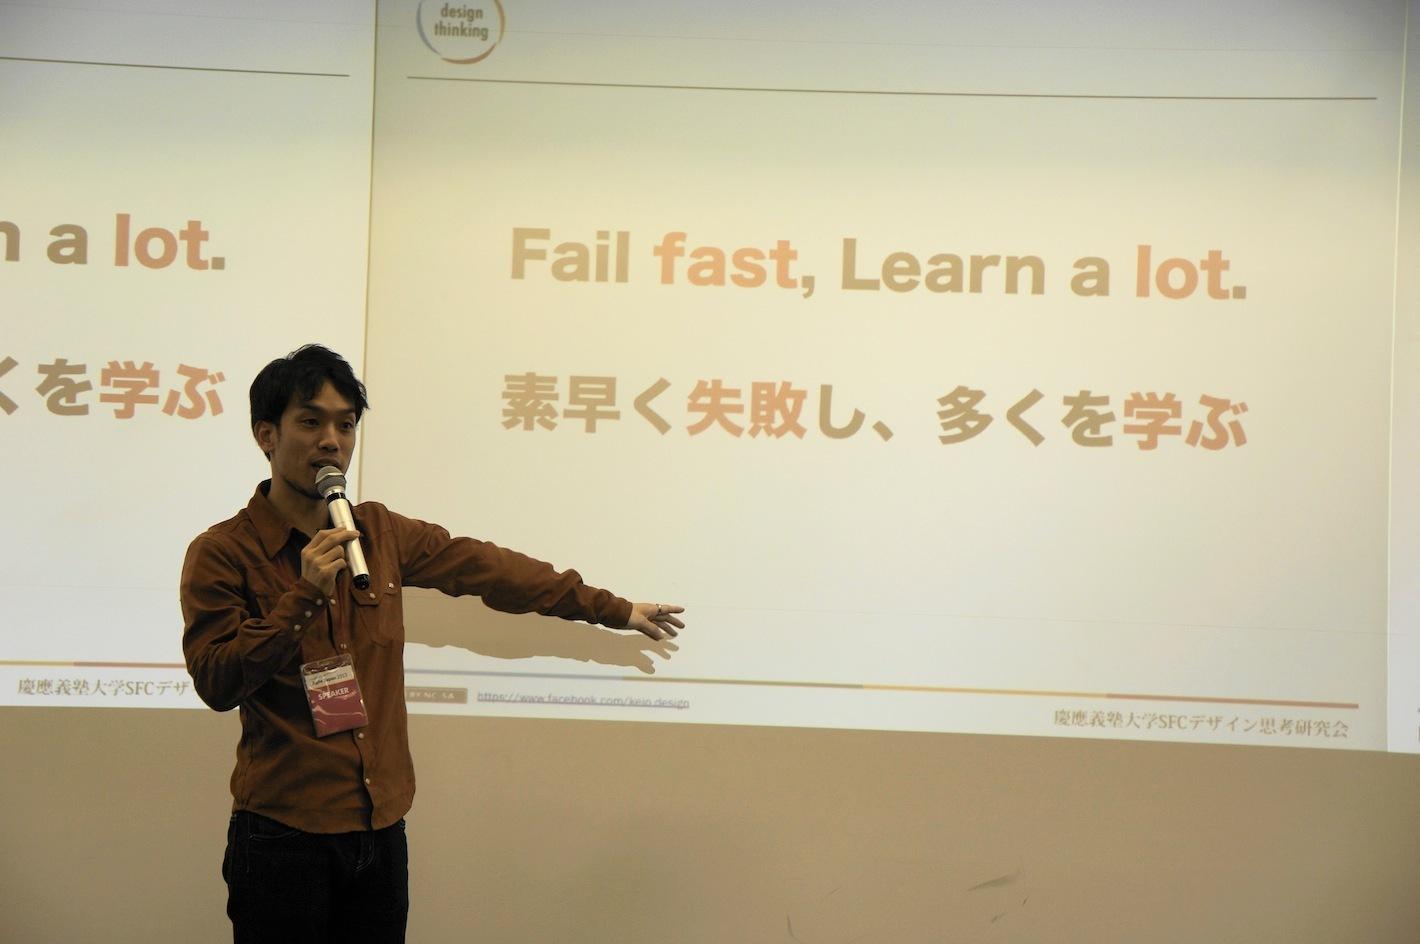 Fail fast Learn a lot